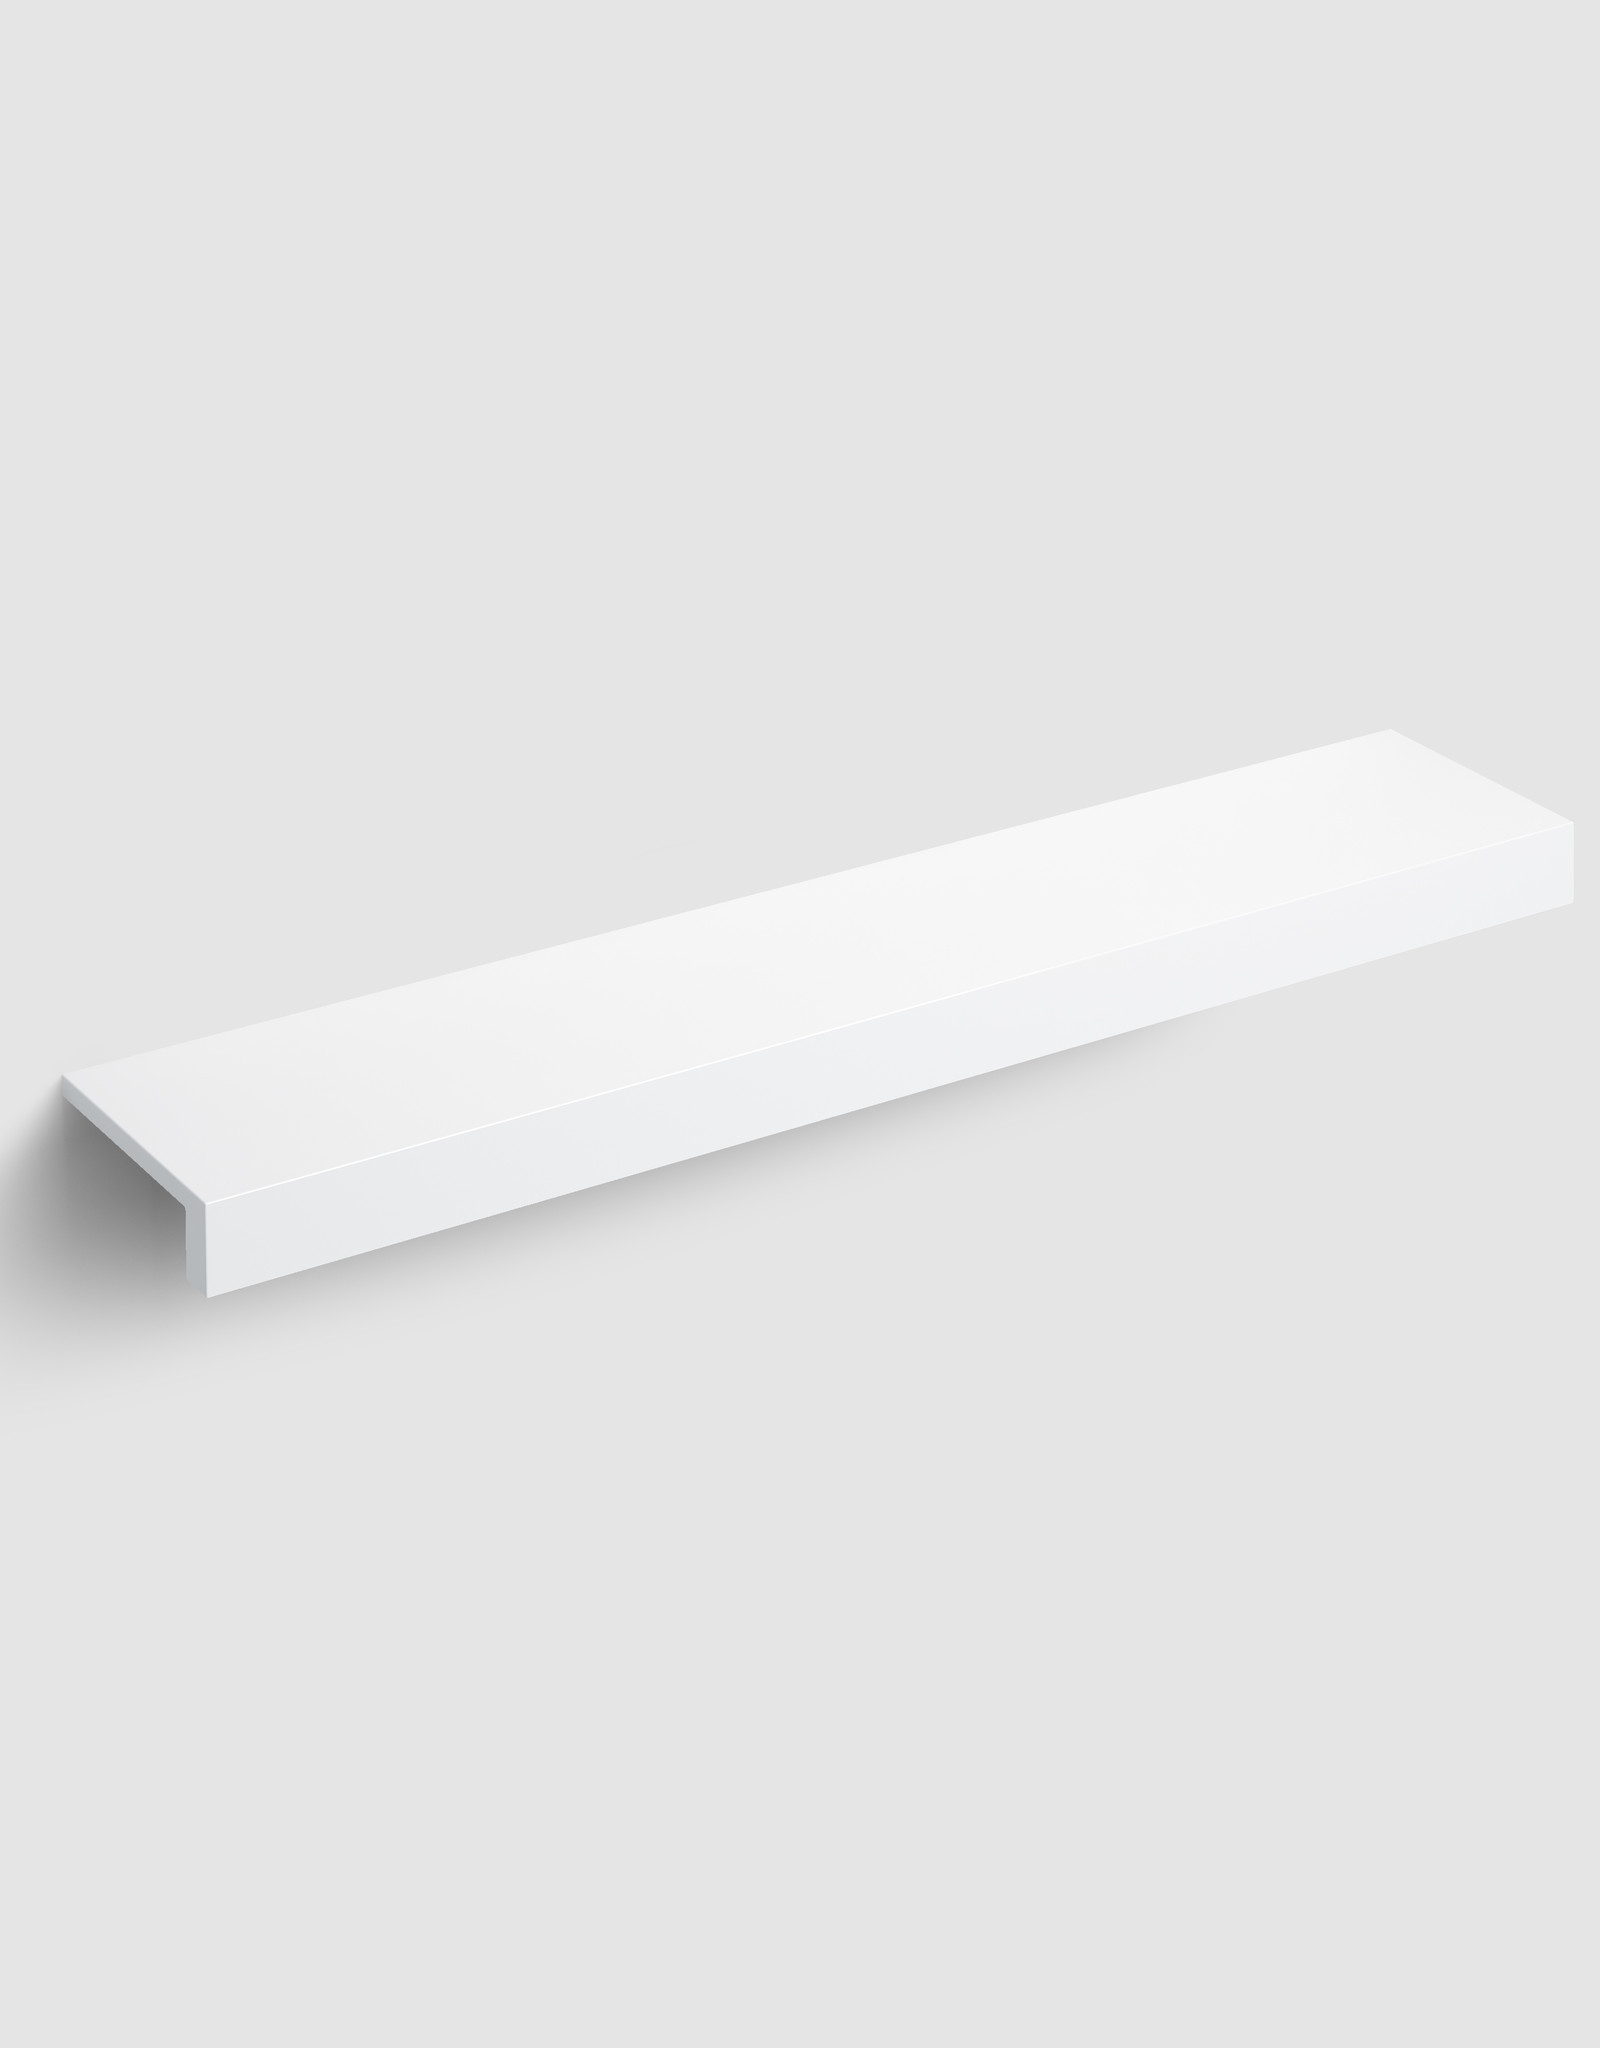 Mini Match Me Shelf 140 cm - outlet